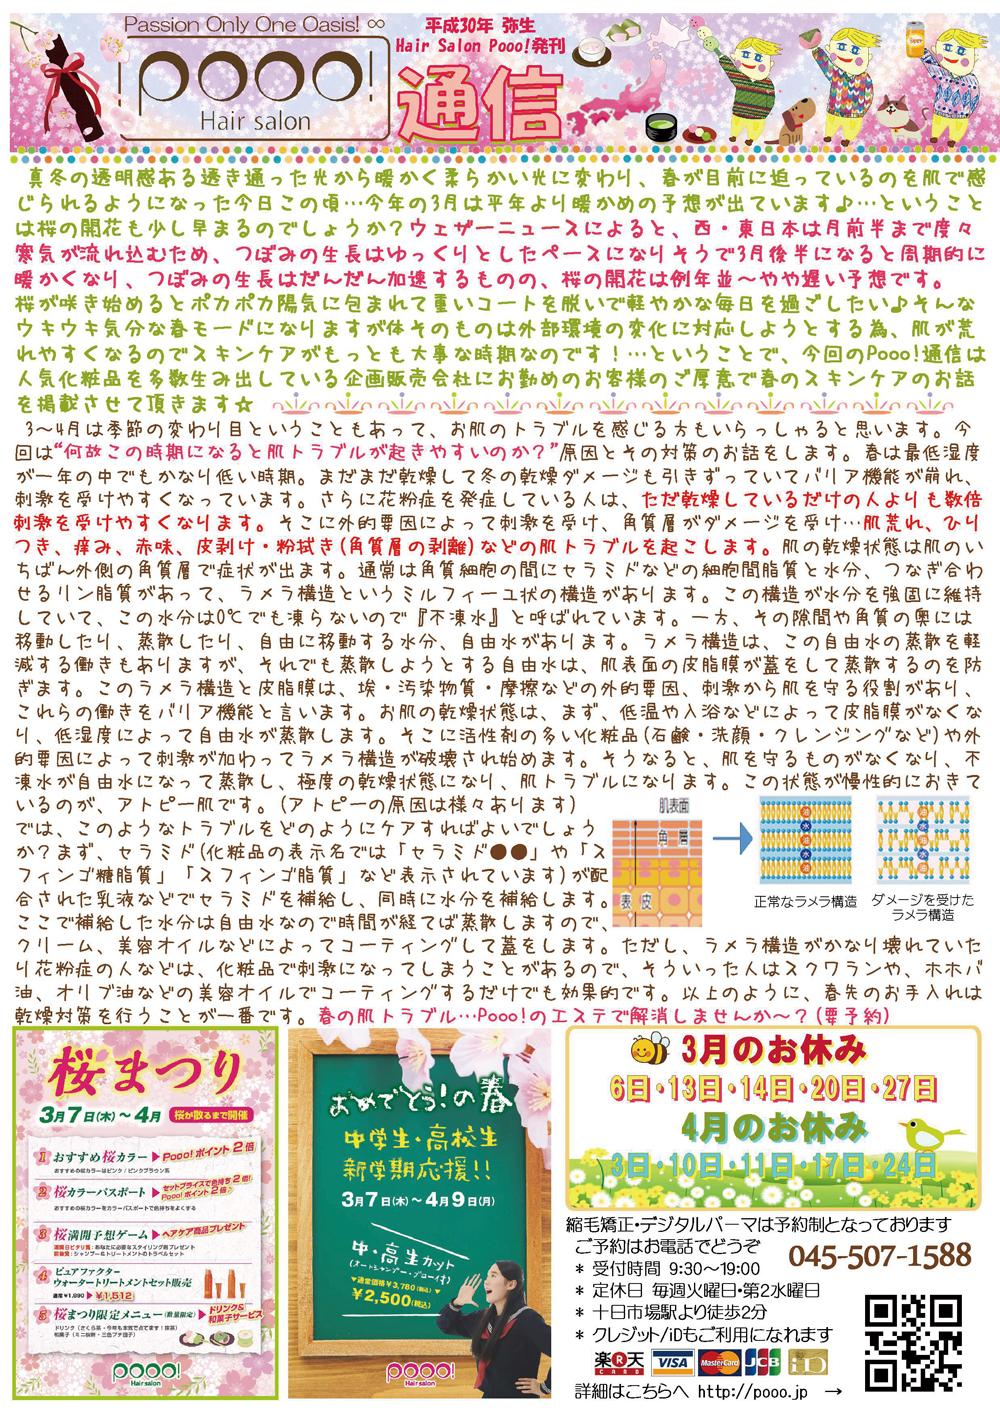 http://pooo.jp/wp-content/uploads/2018/02/Pooonews18-03.jpg